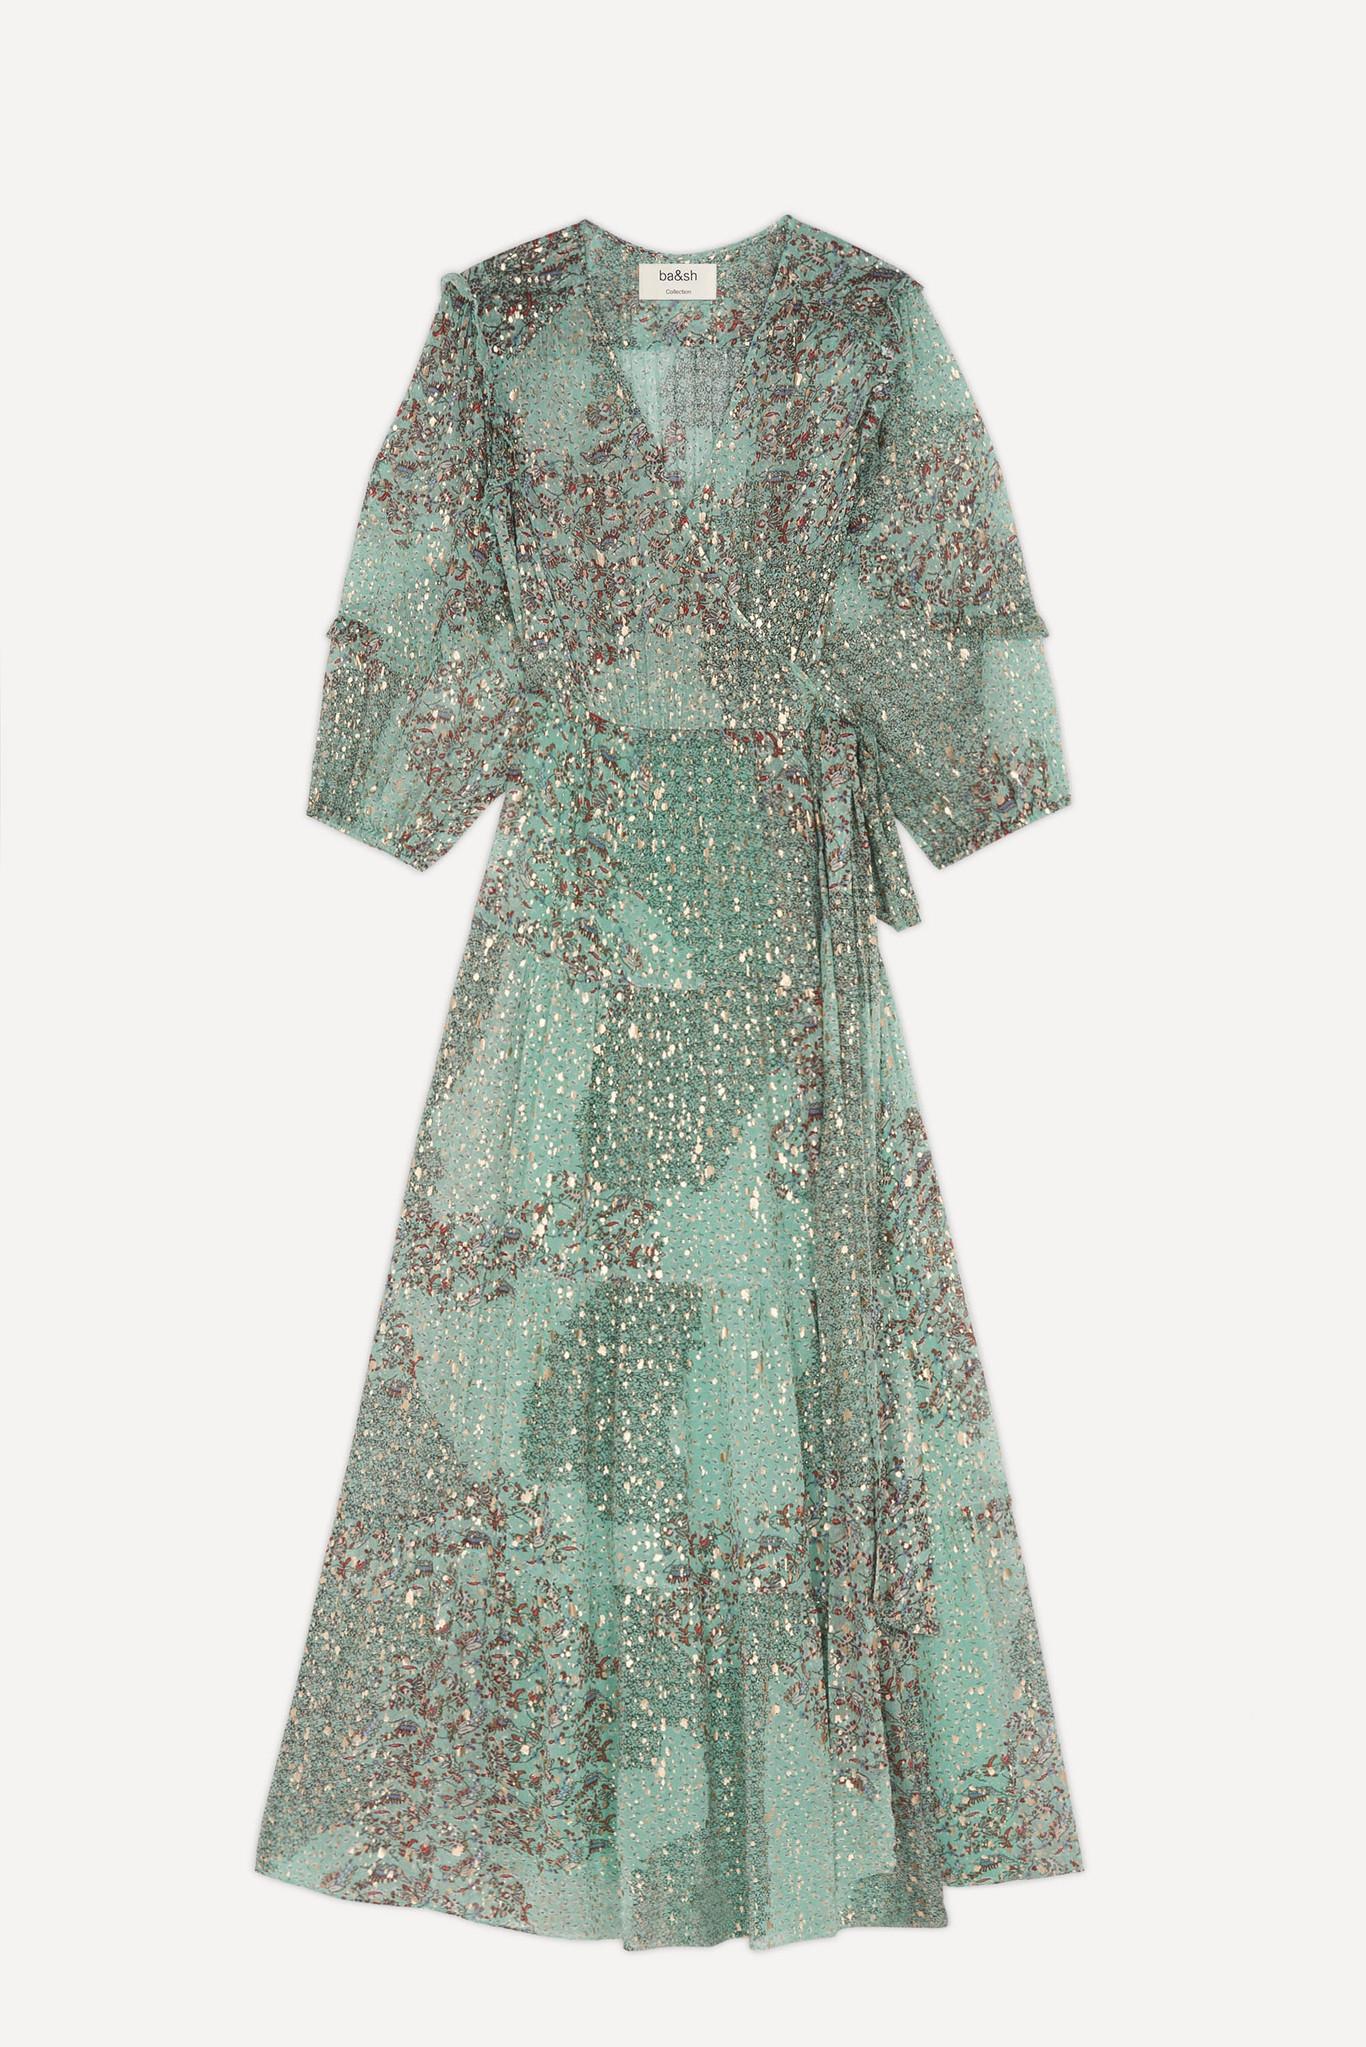 ORIANE robe longue-1